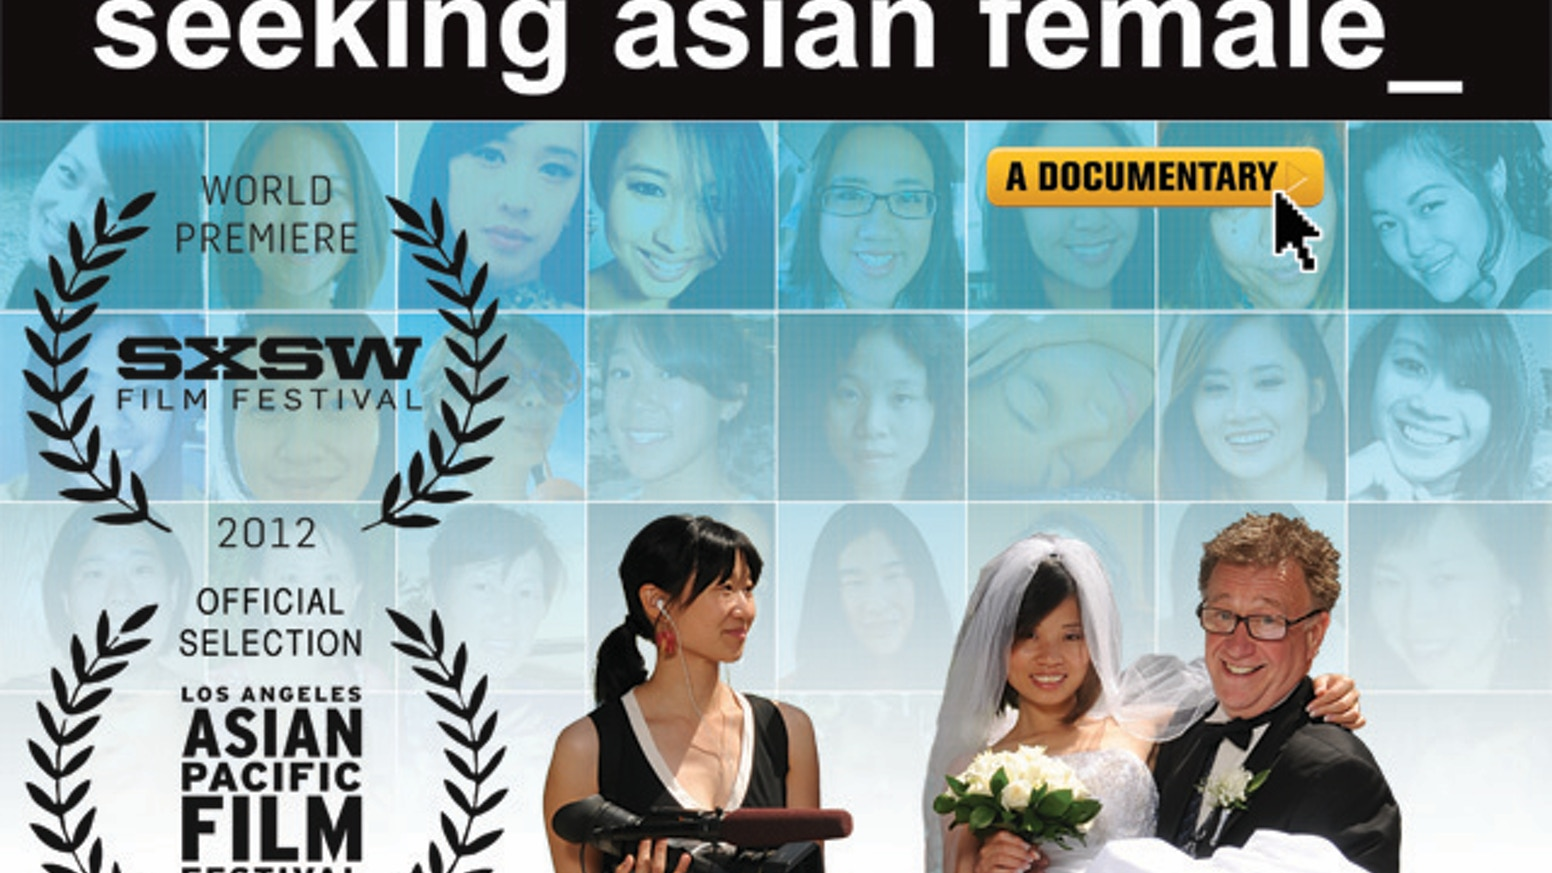 Asian foot fetish stories — pic 9